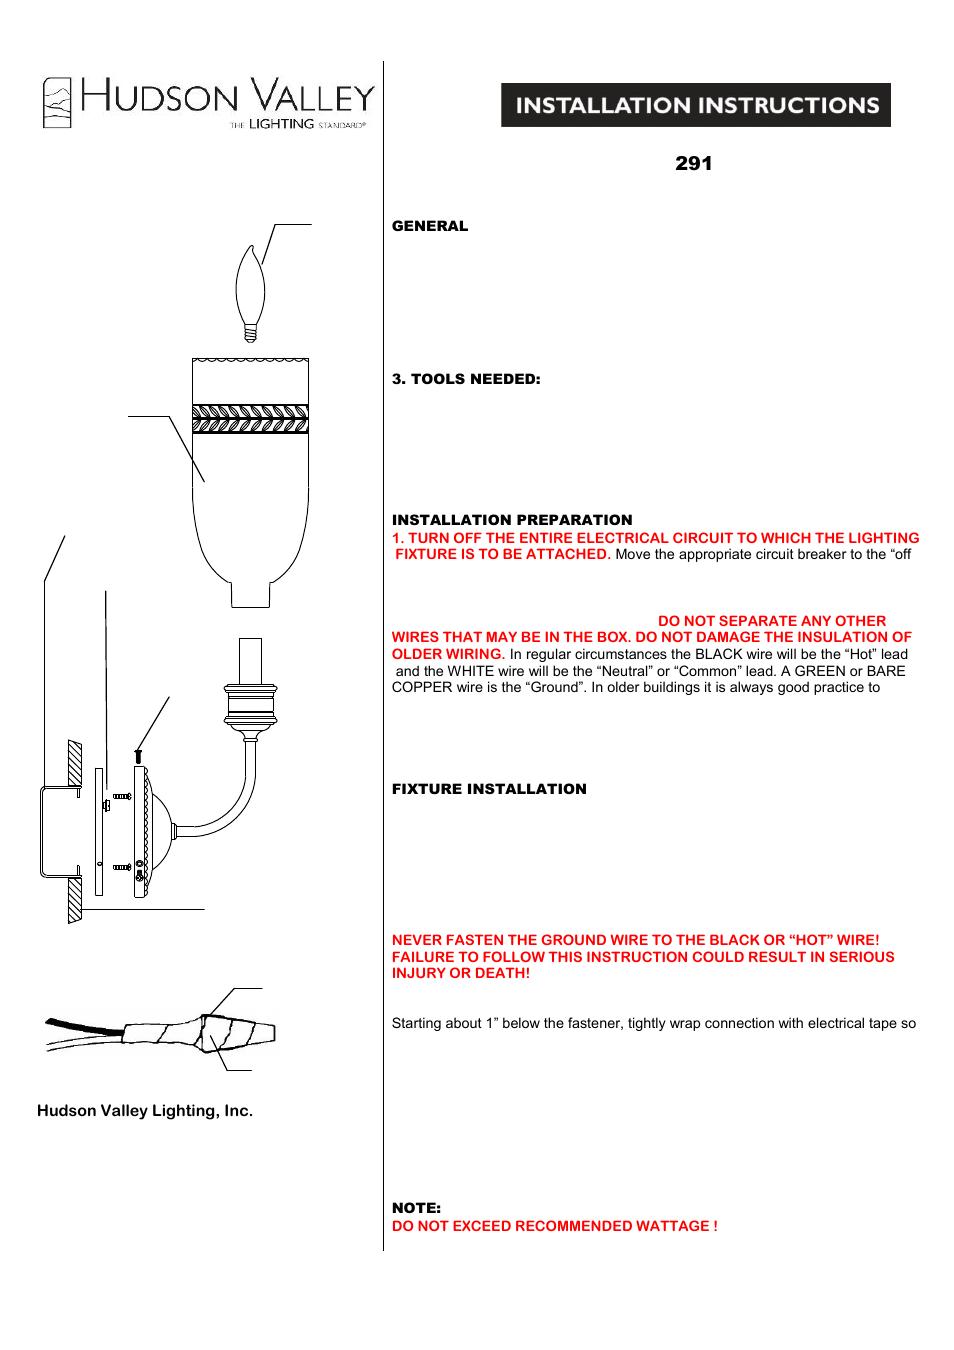 hudson valley lighting lafayette 291 user manual 1 page